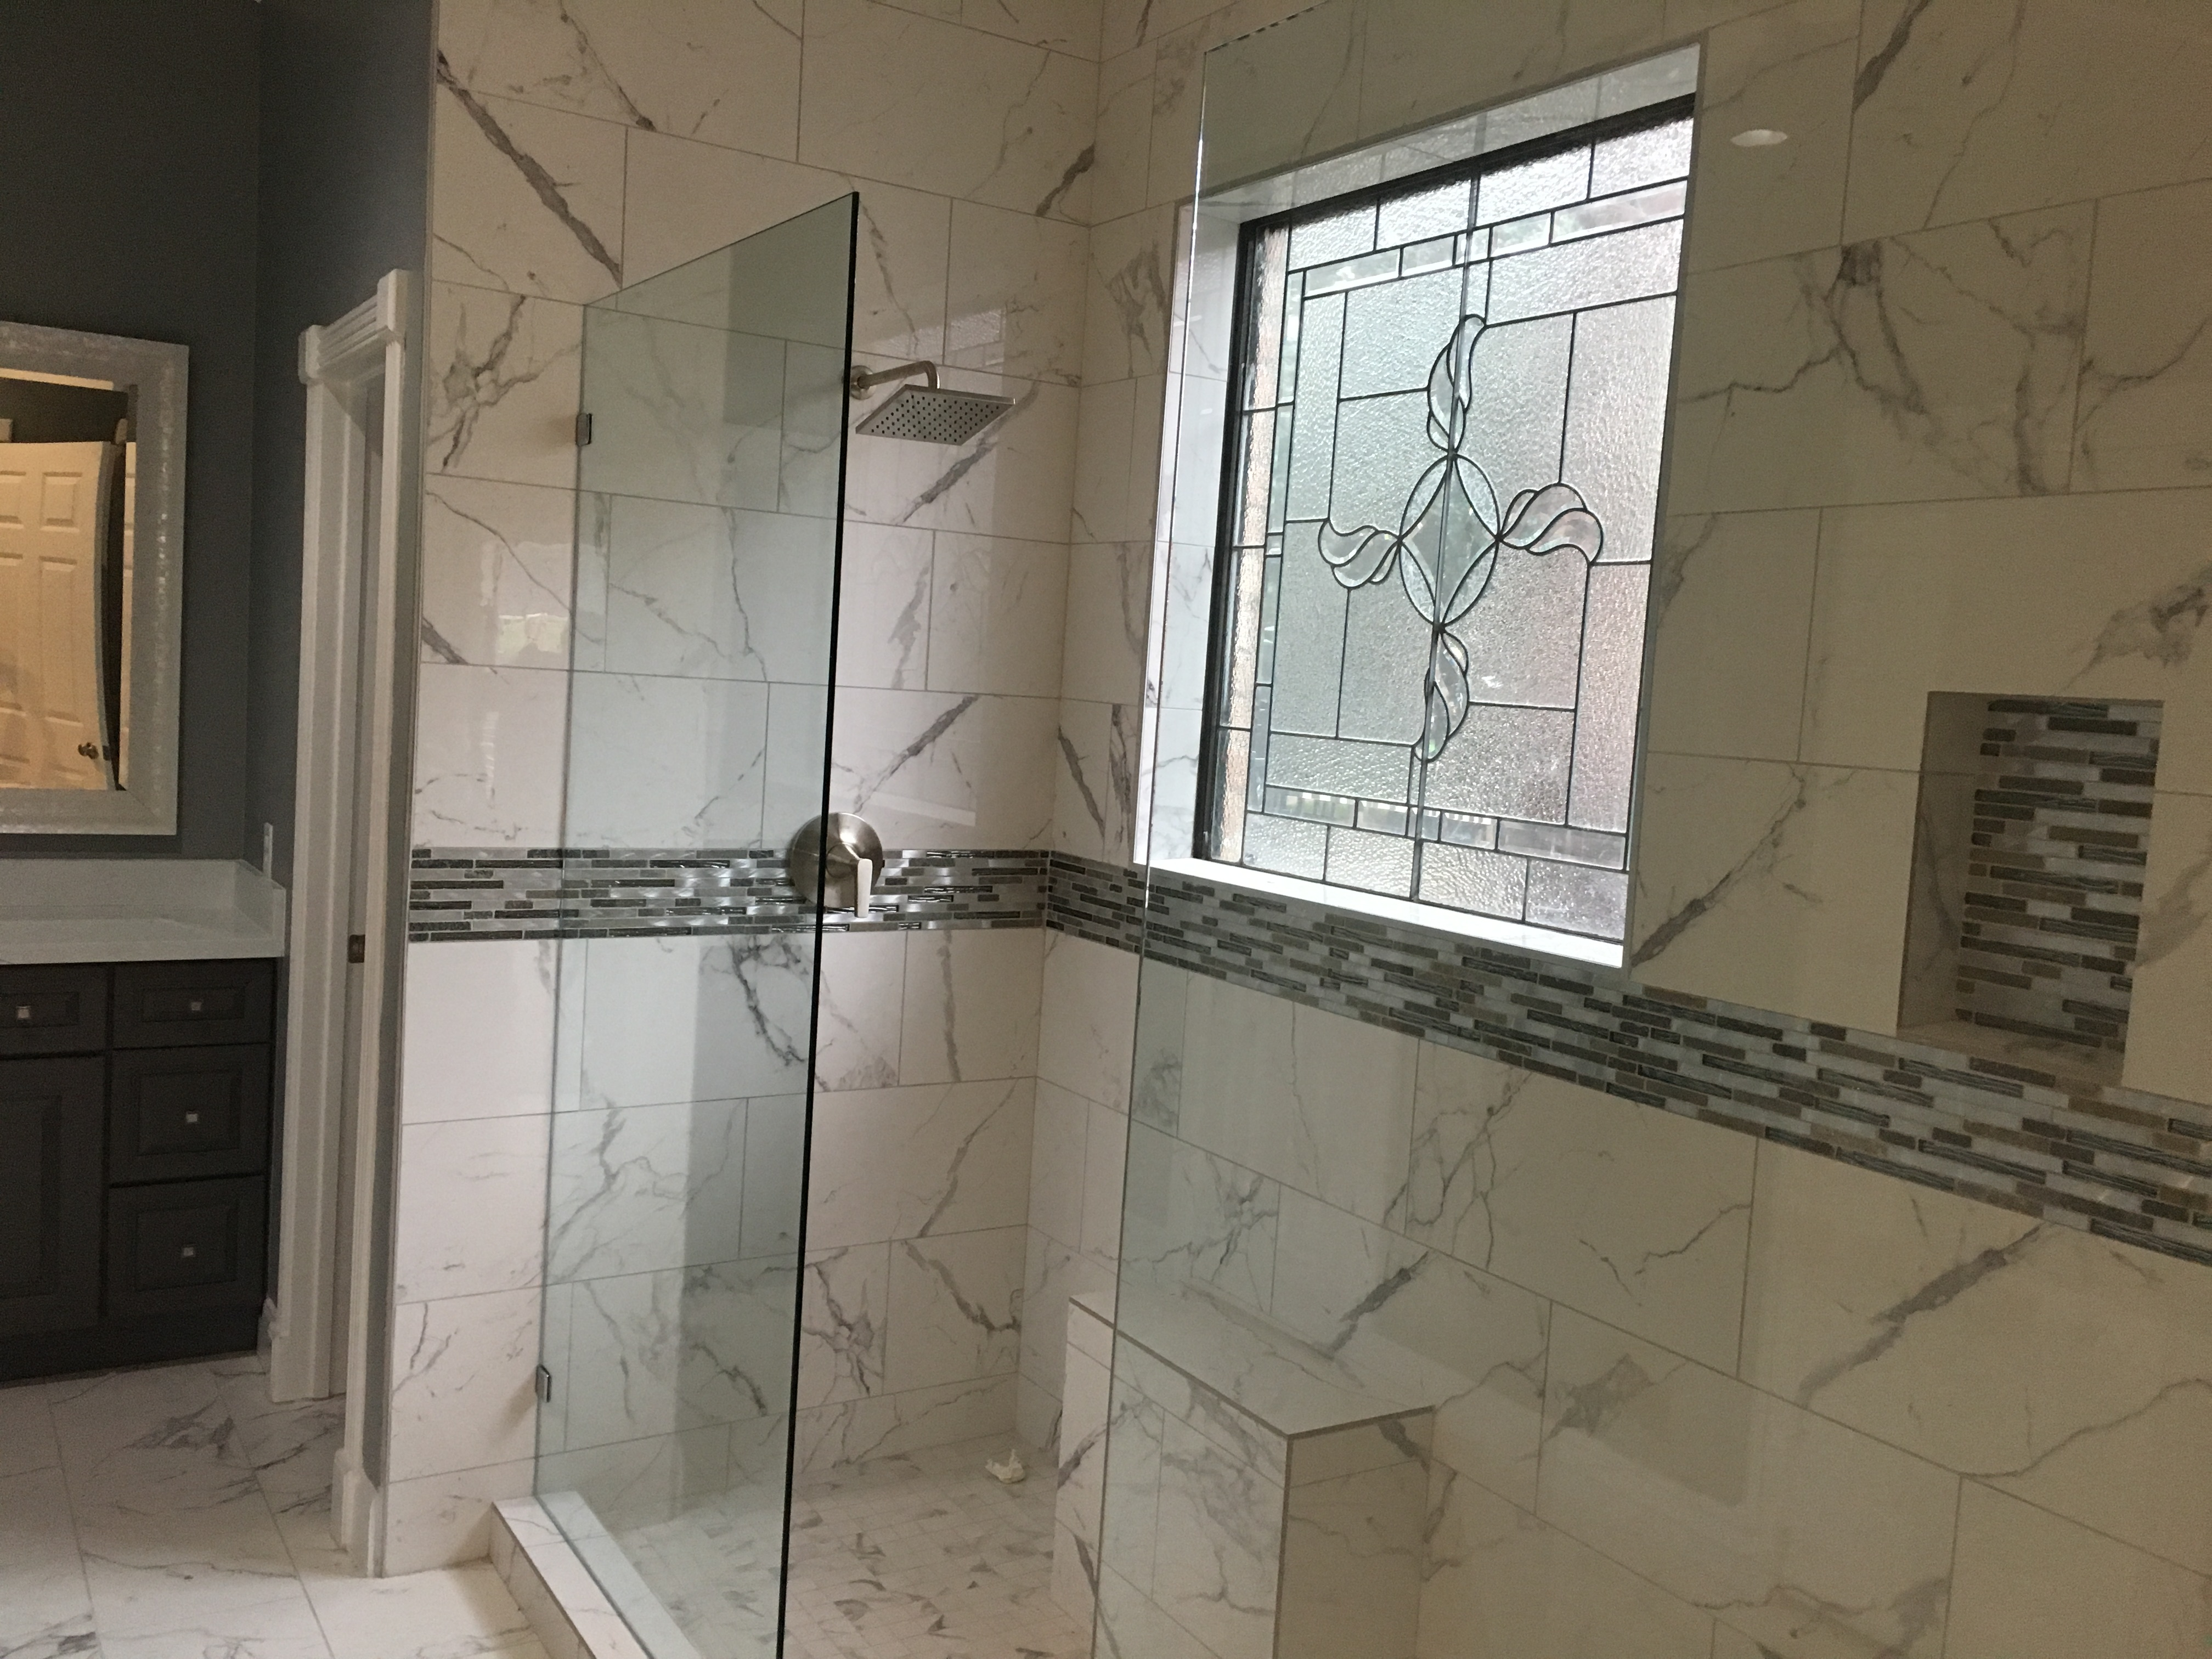 Artech design inc - DBA Floors Kitchen and Bath image 22